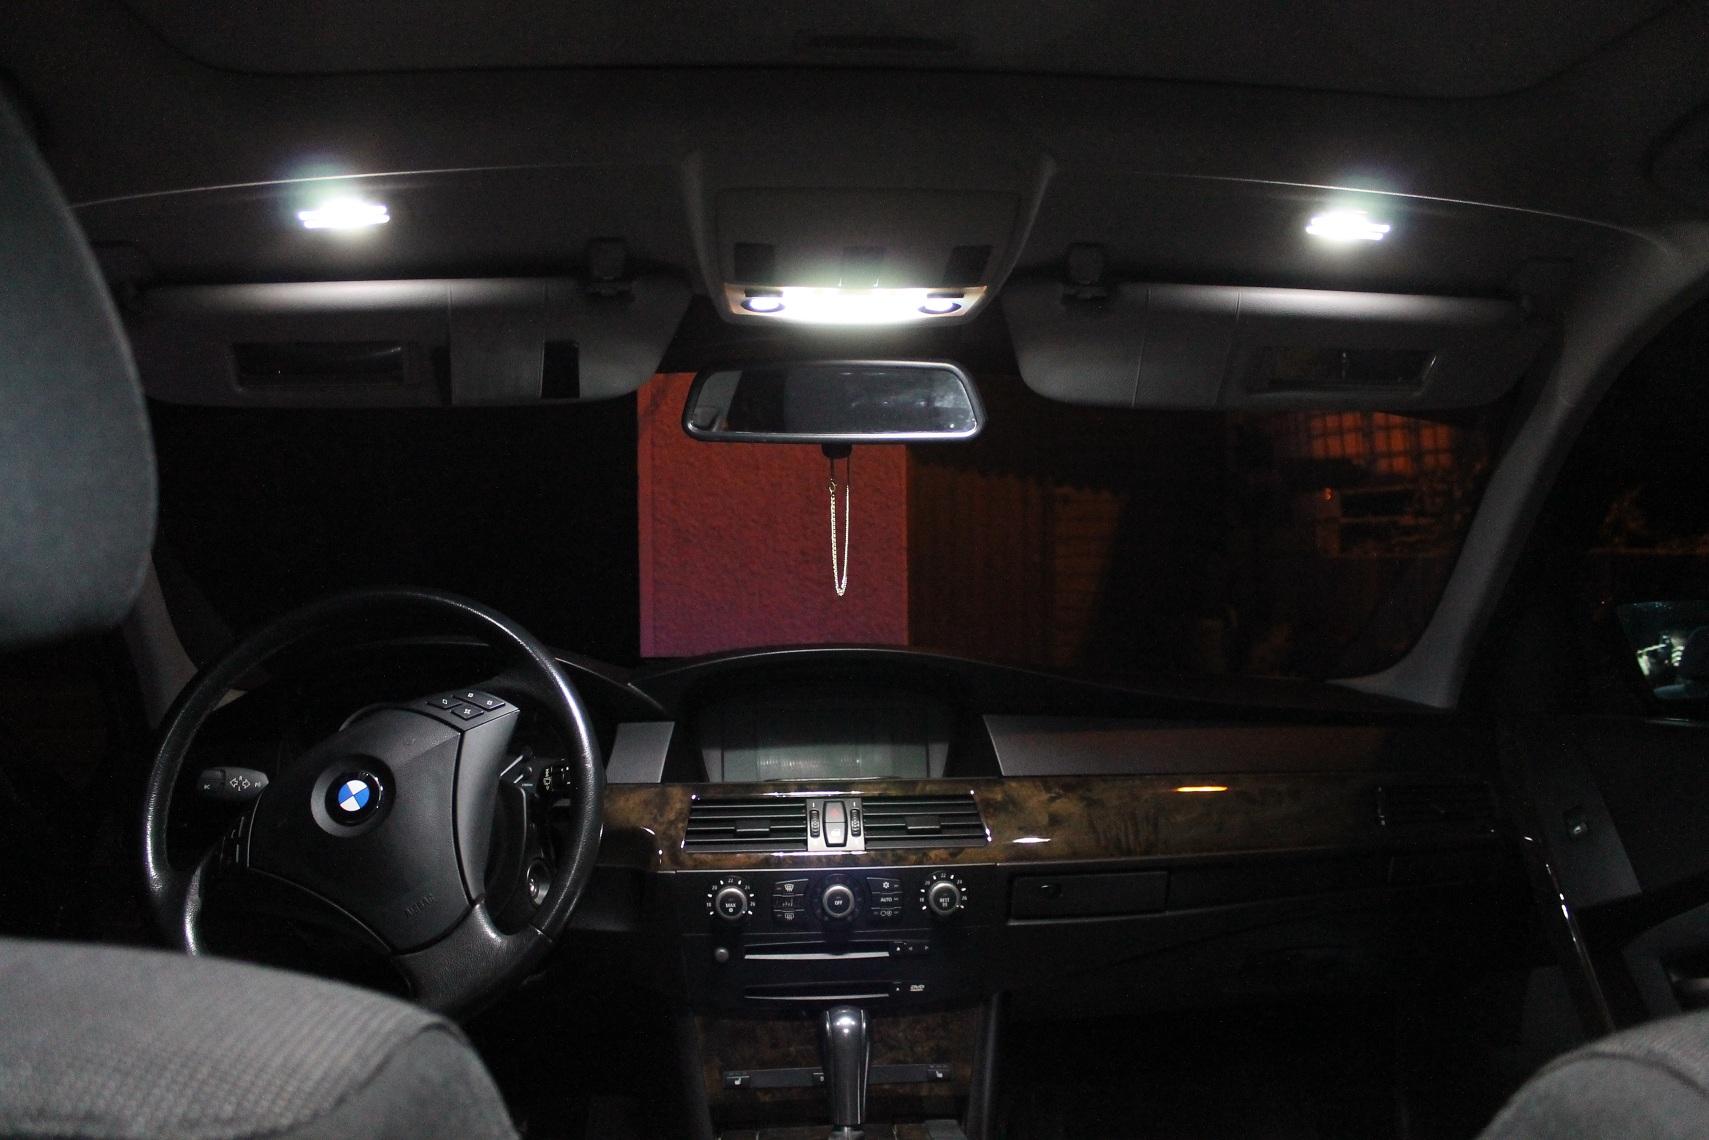 led innenraumbeleuchtung set f r bmw e60 e65 e87. Black Bedroom Furniture Sets. Home Design Ideas